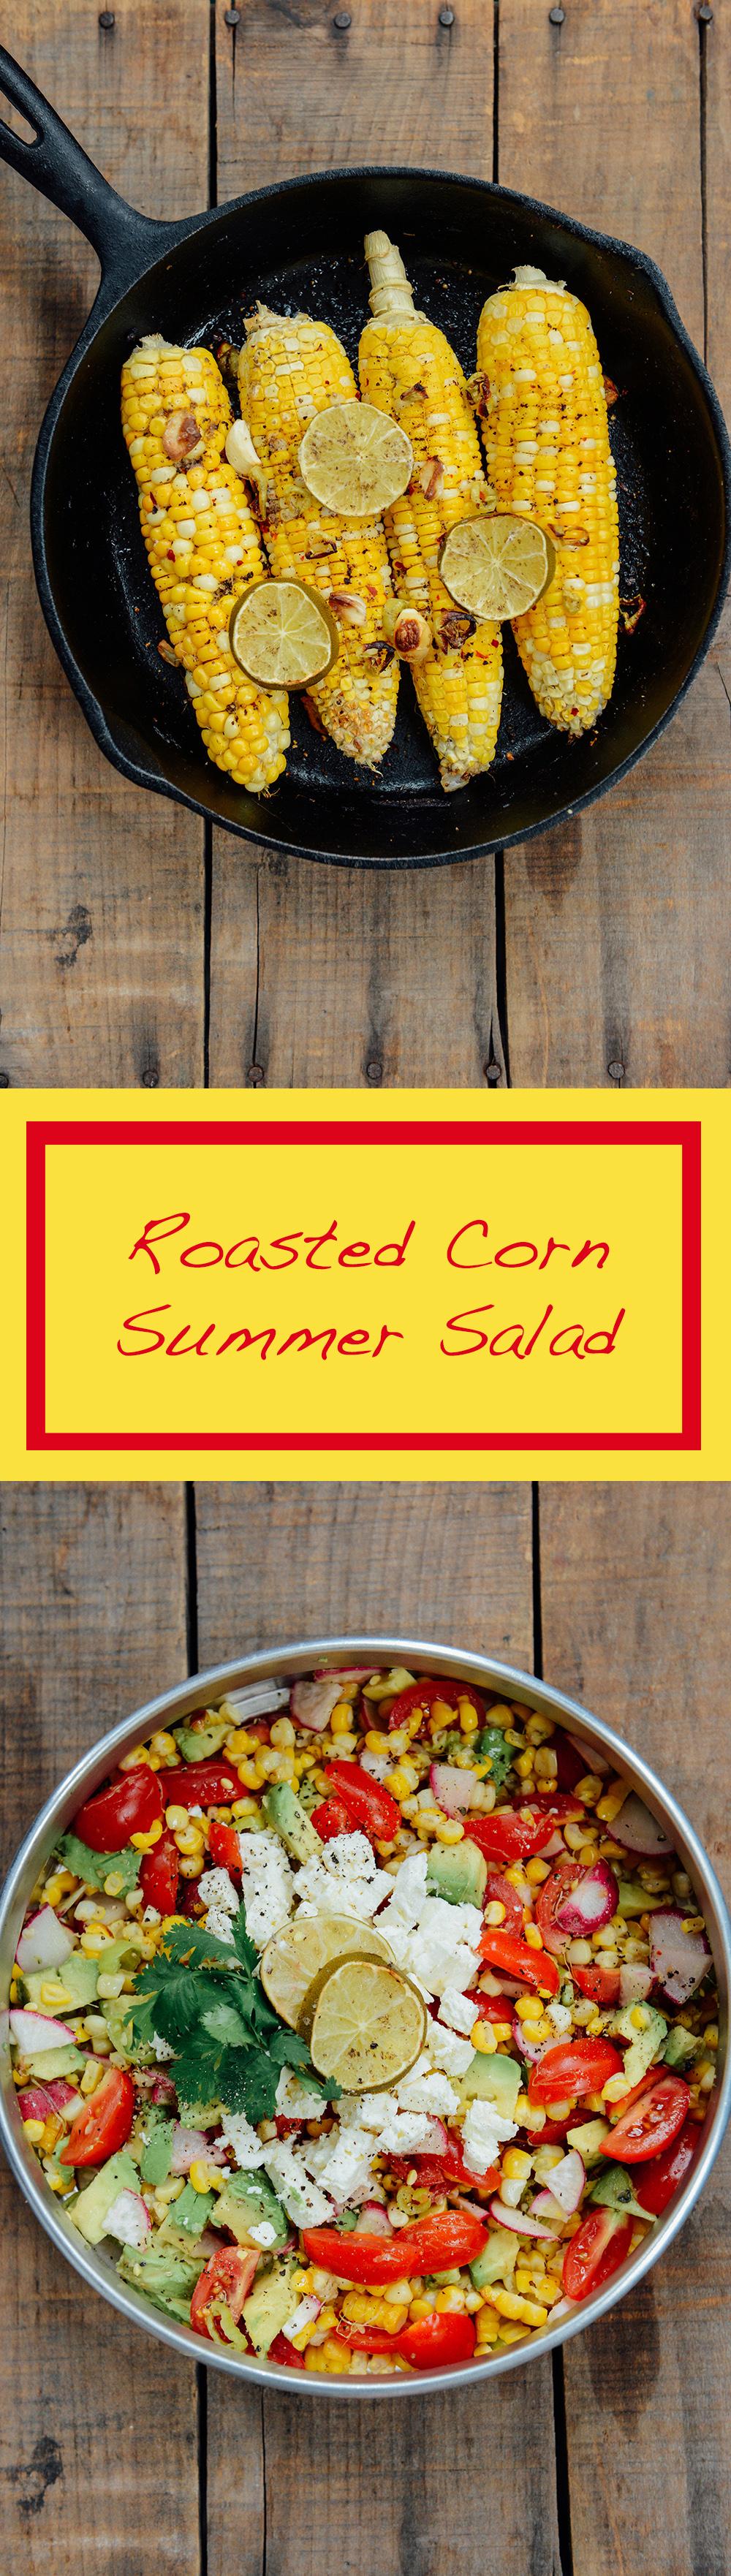 Roasted Corn Summer Salad // www.WithTheGrains.com